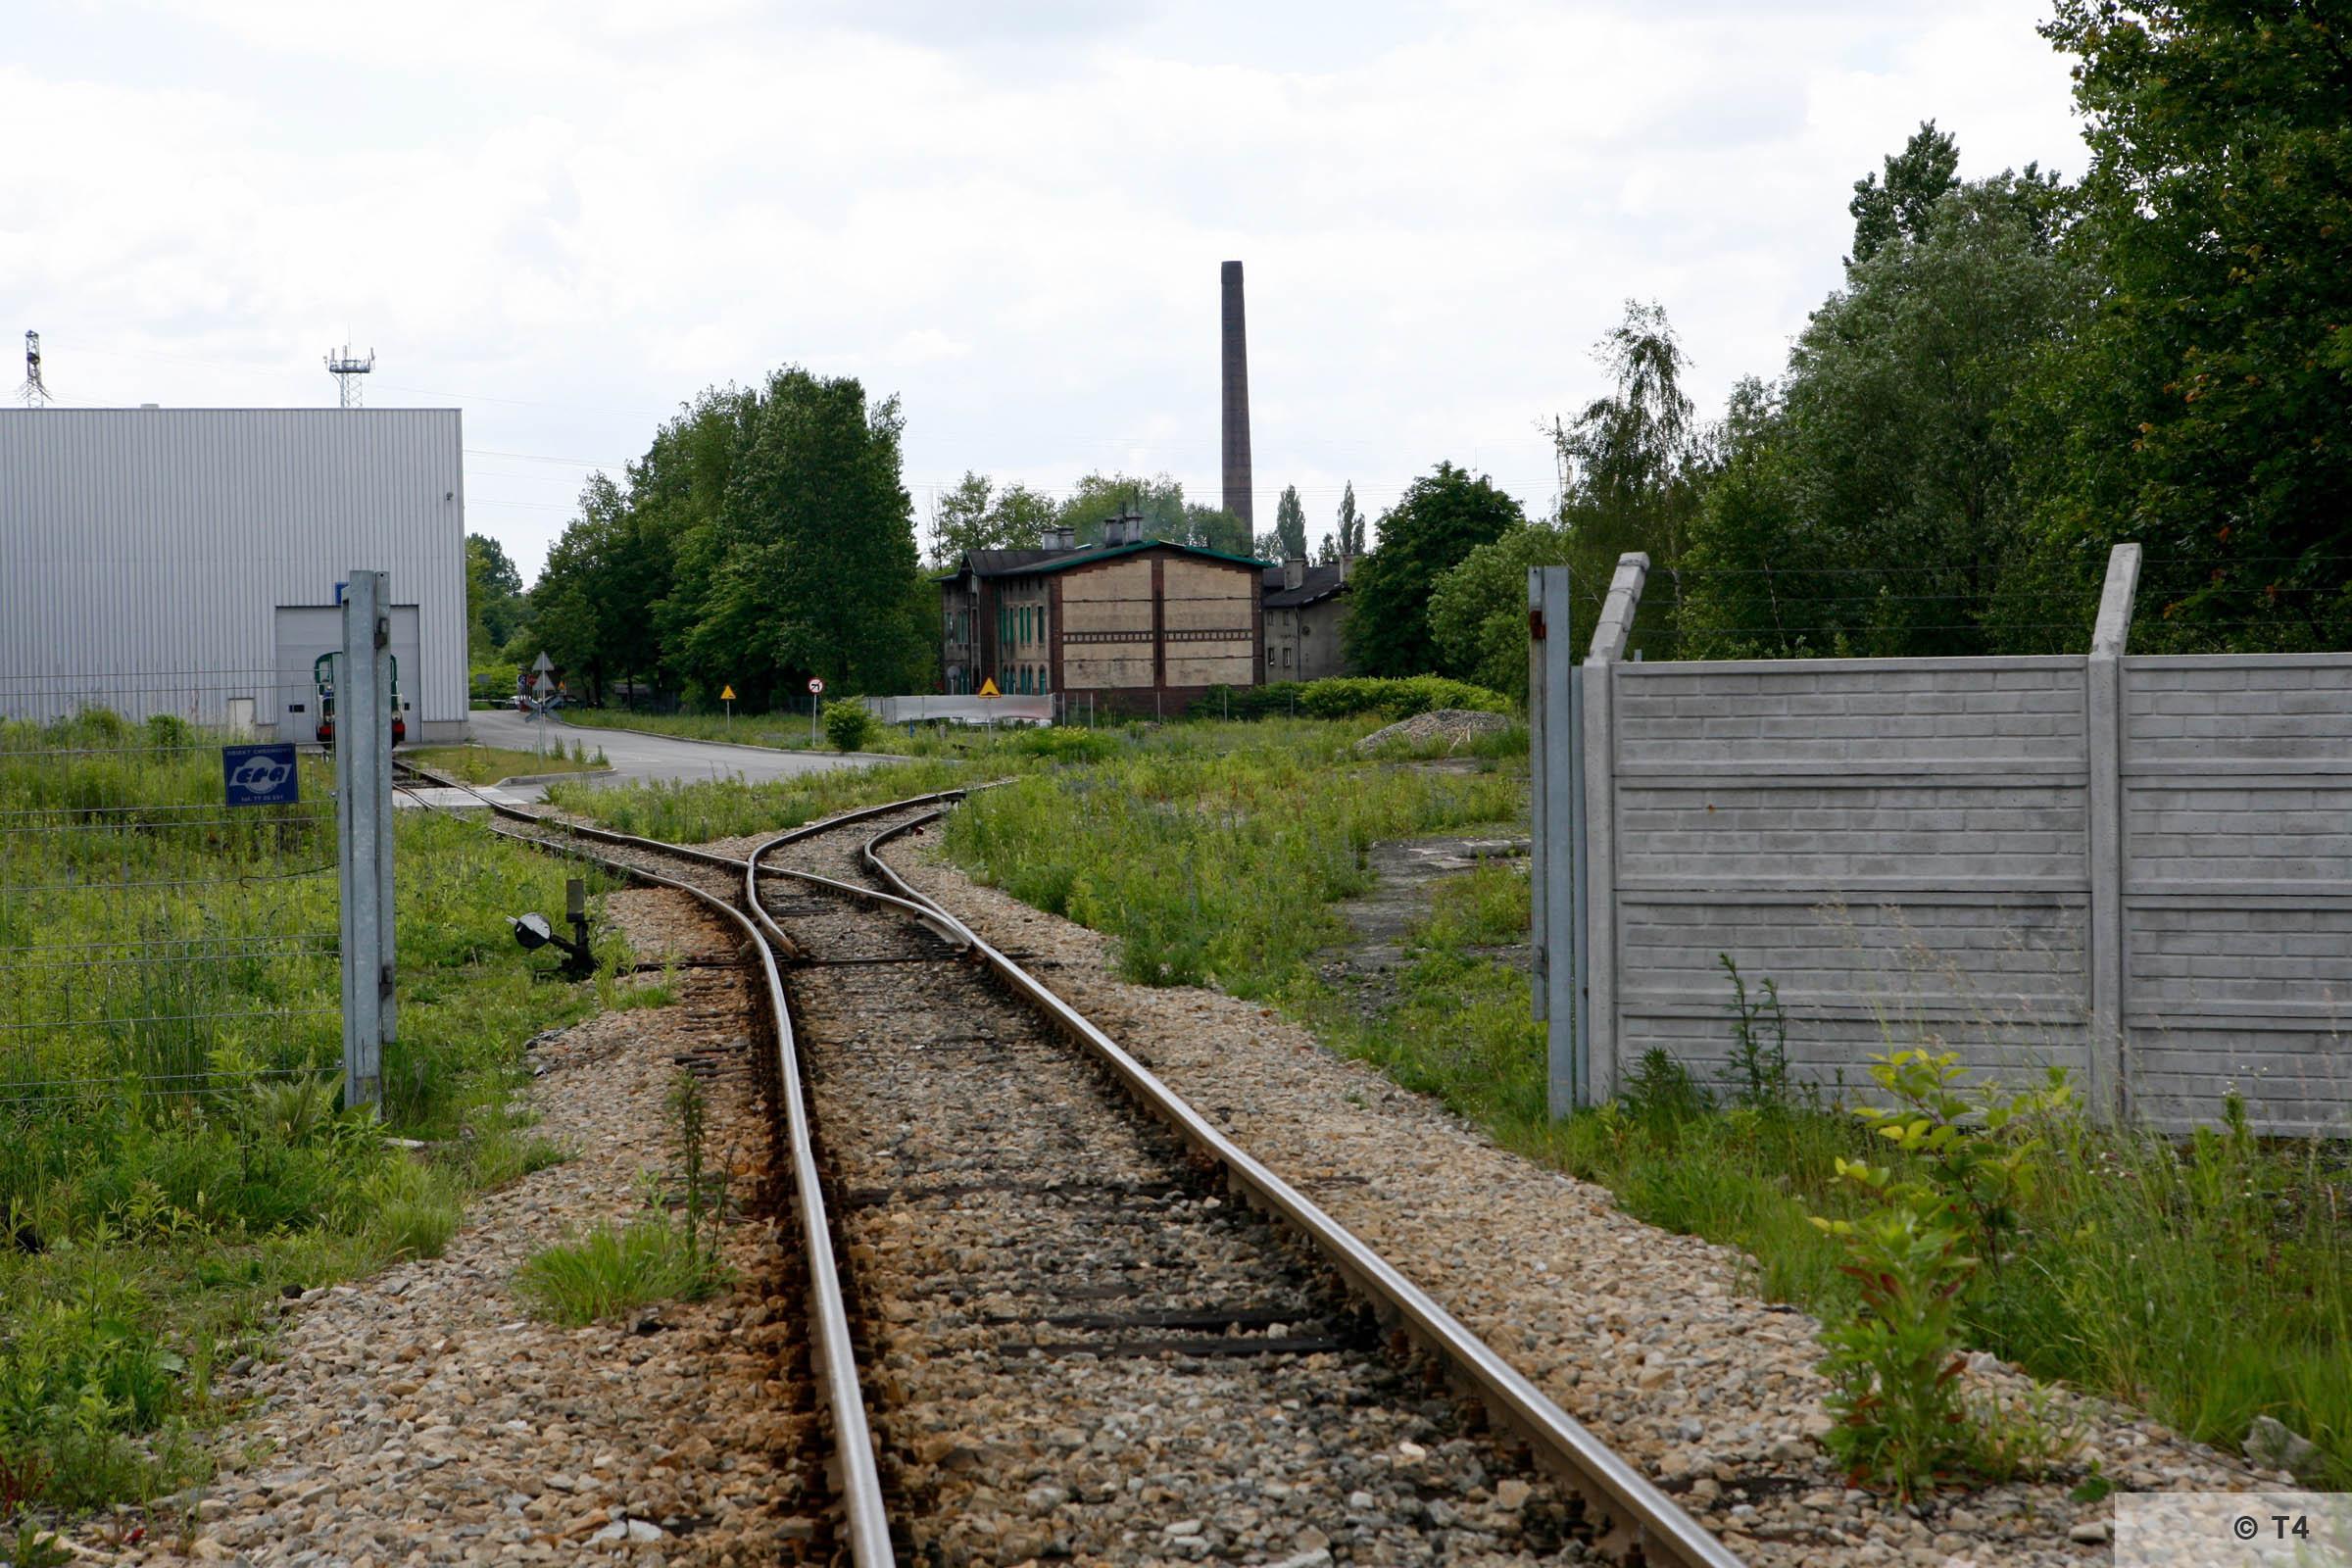 Zygmunt steel works. Rail tracks. 2006 T4 6236